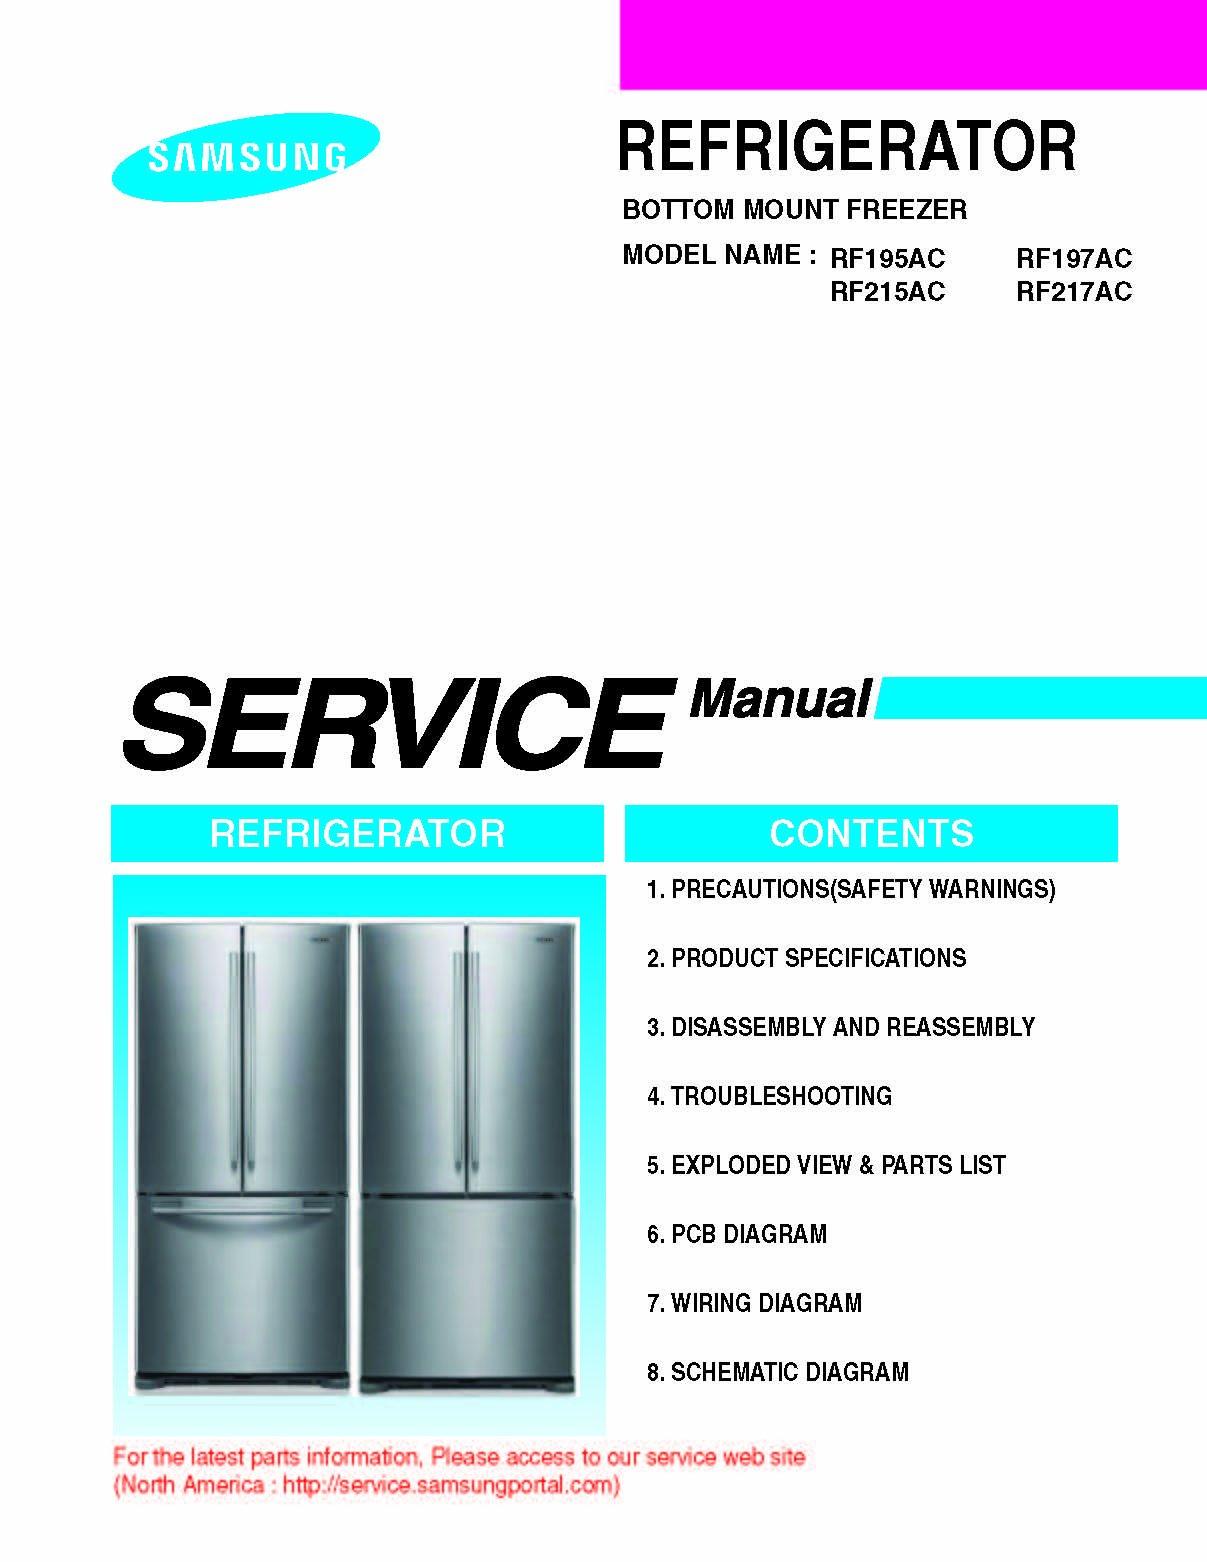 Samsung Rf217acrs Xaa Service Manual And Rf217acpn Refrigerator Wiring Schematic Rf217acbp Books